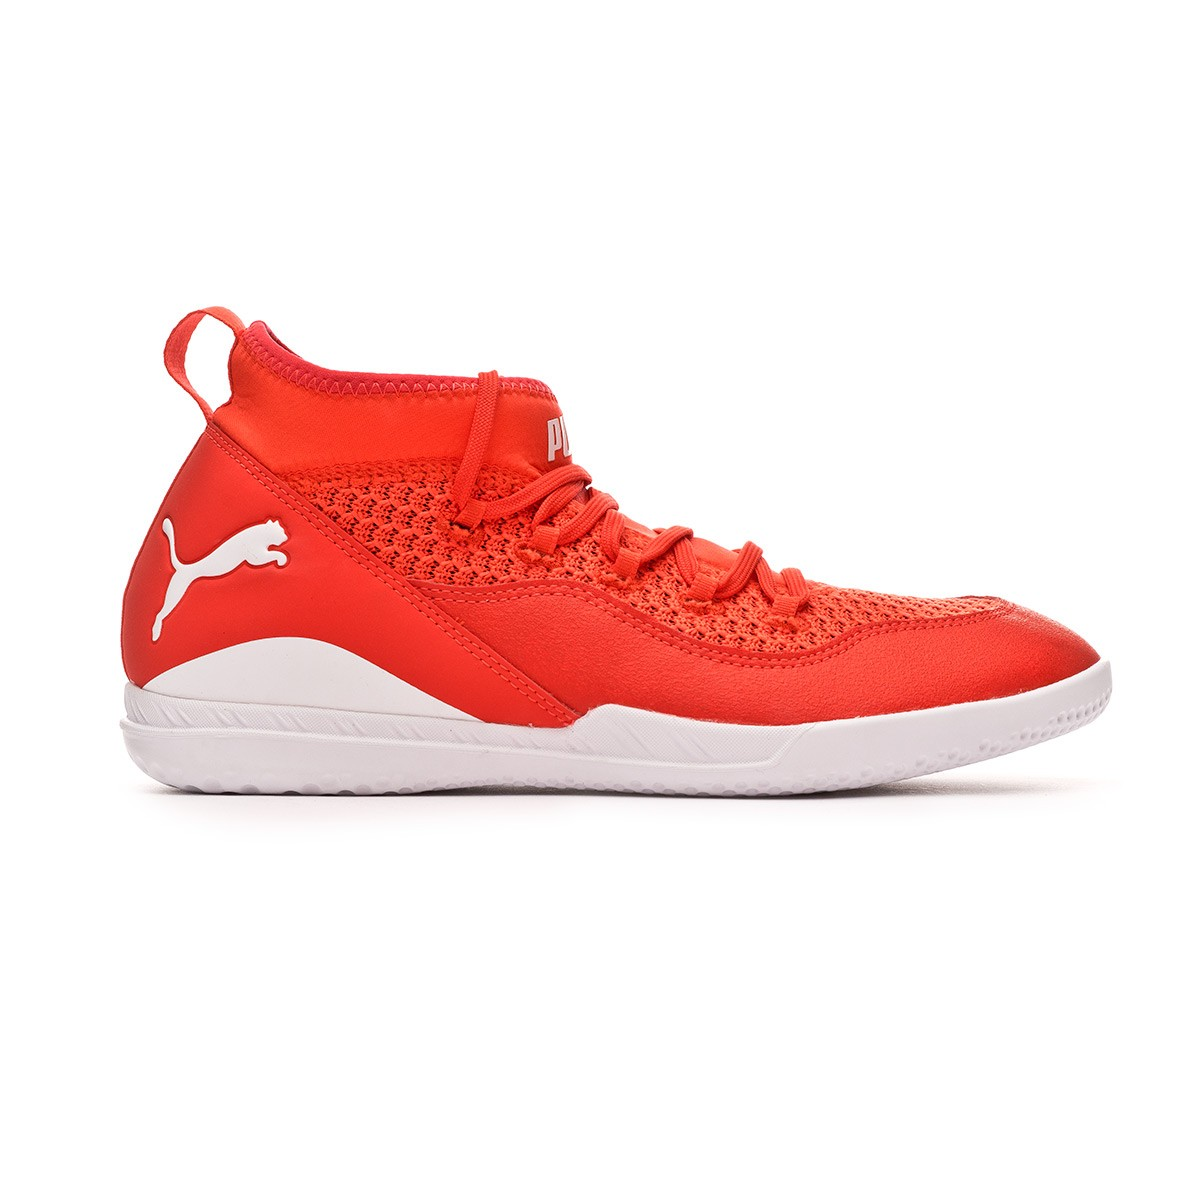 33791f1c48d7 Futsal Boot Puma 365 FF CT Red blast-White-Black - Football store Fútbol  Emotion